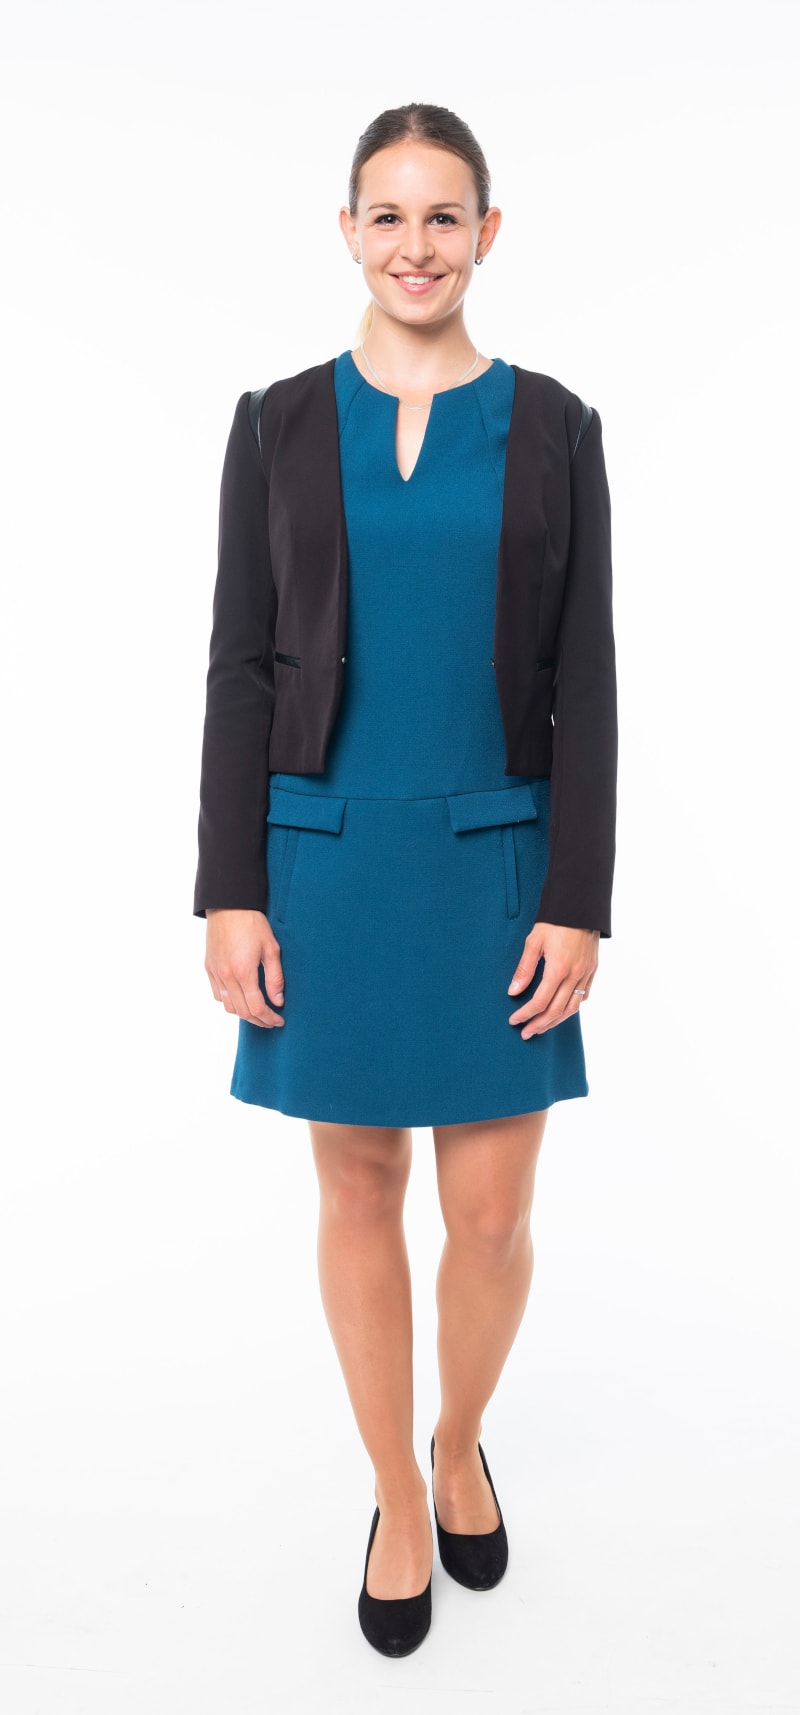 Robe bleue veste noire